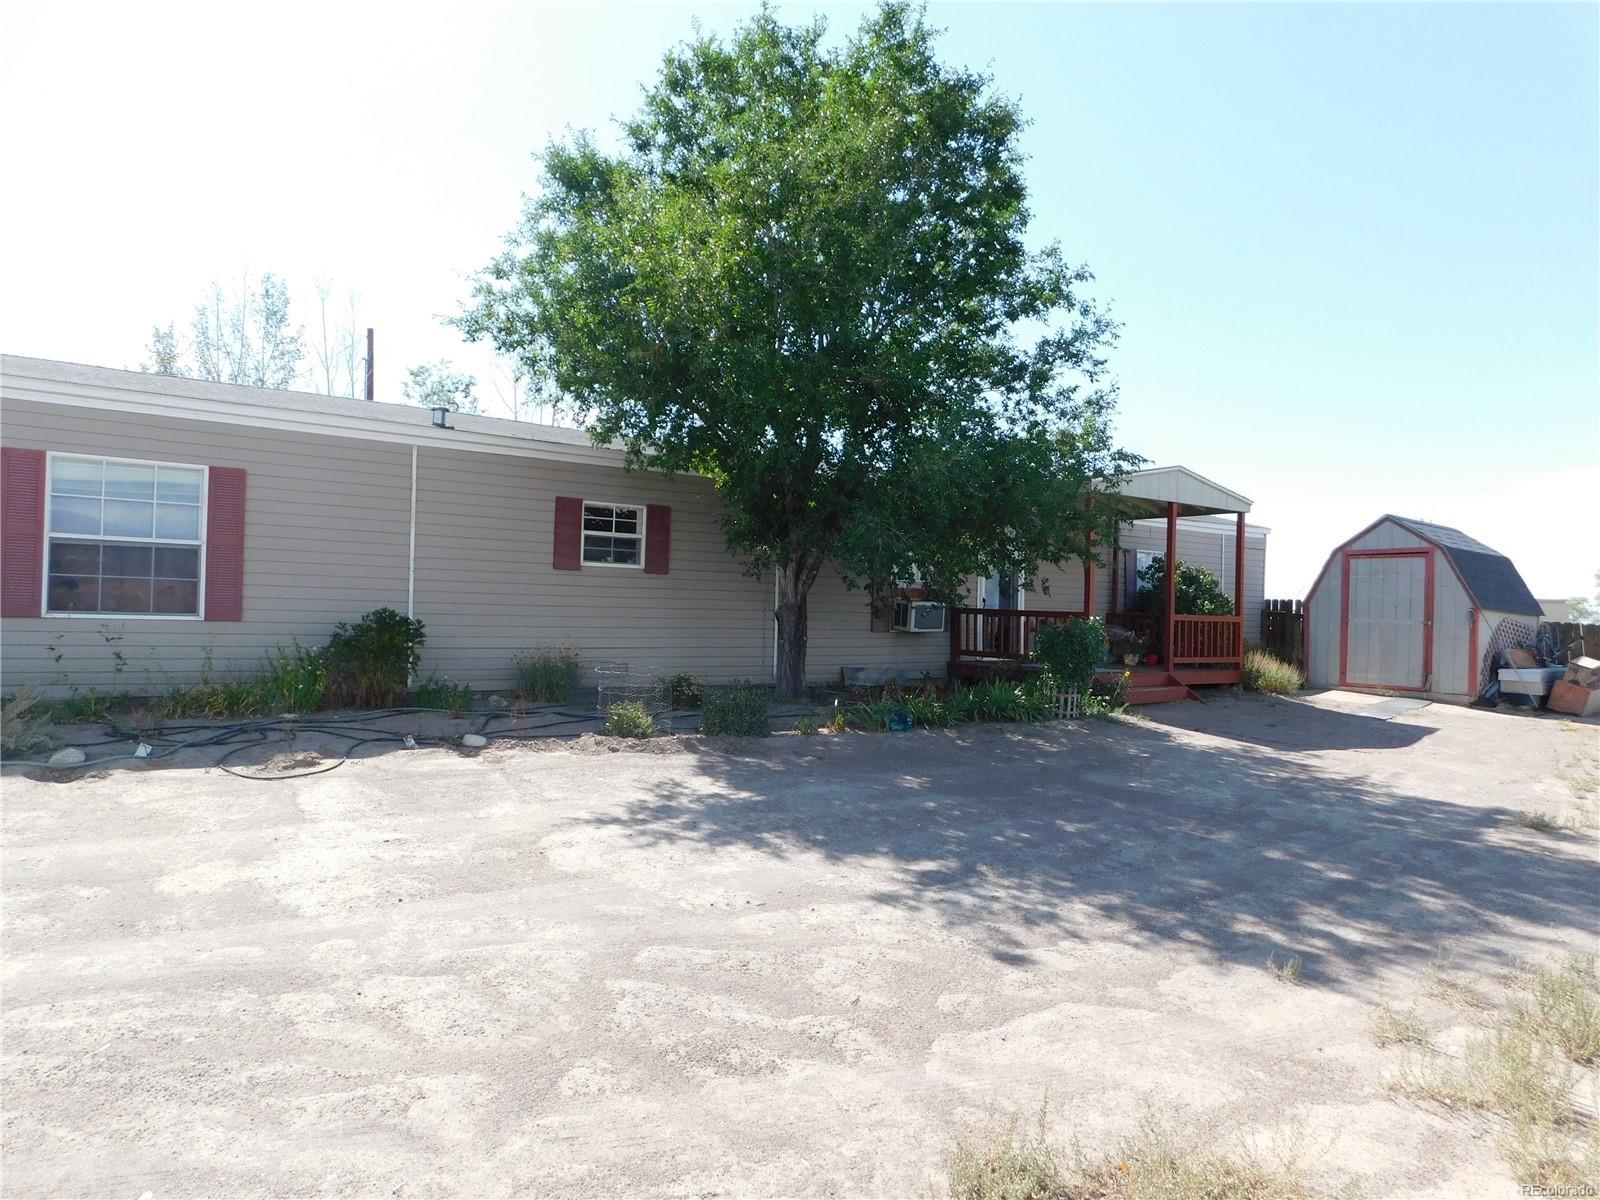 18171 Otter Drive, Alamosa, CO 81101 - Alamosa, CO real estate listing